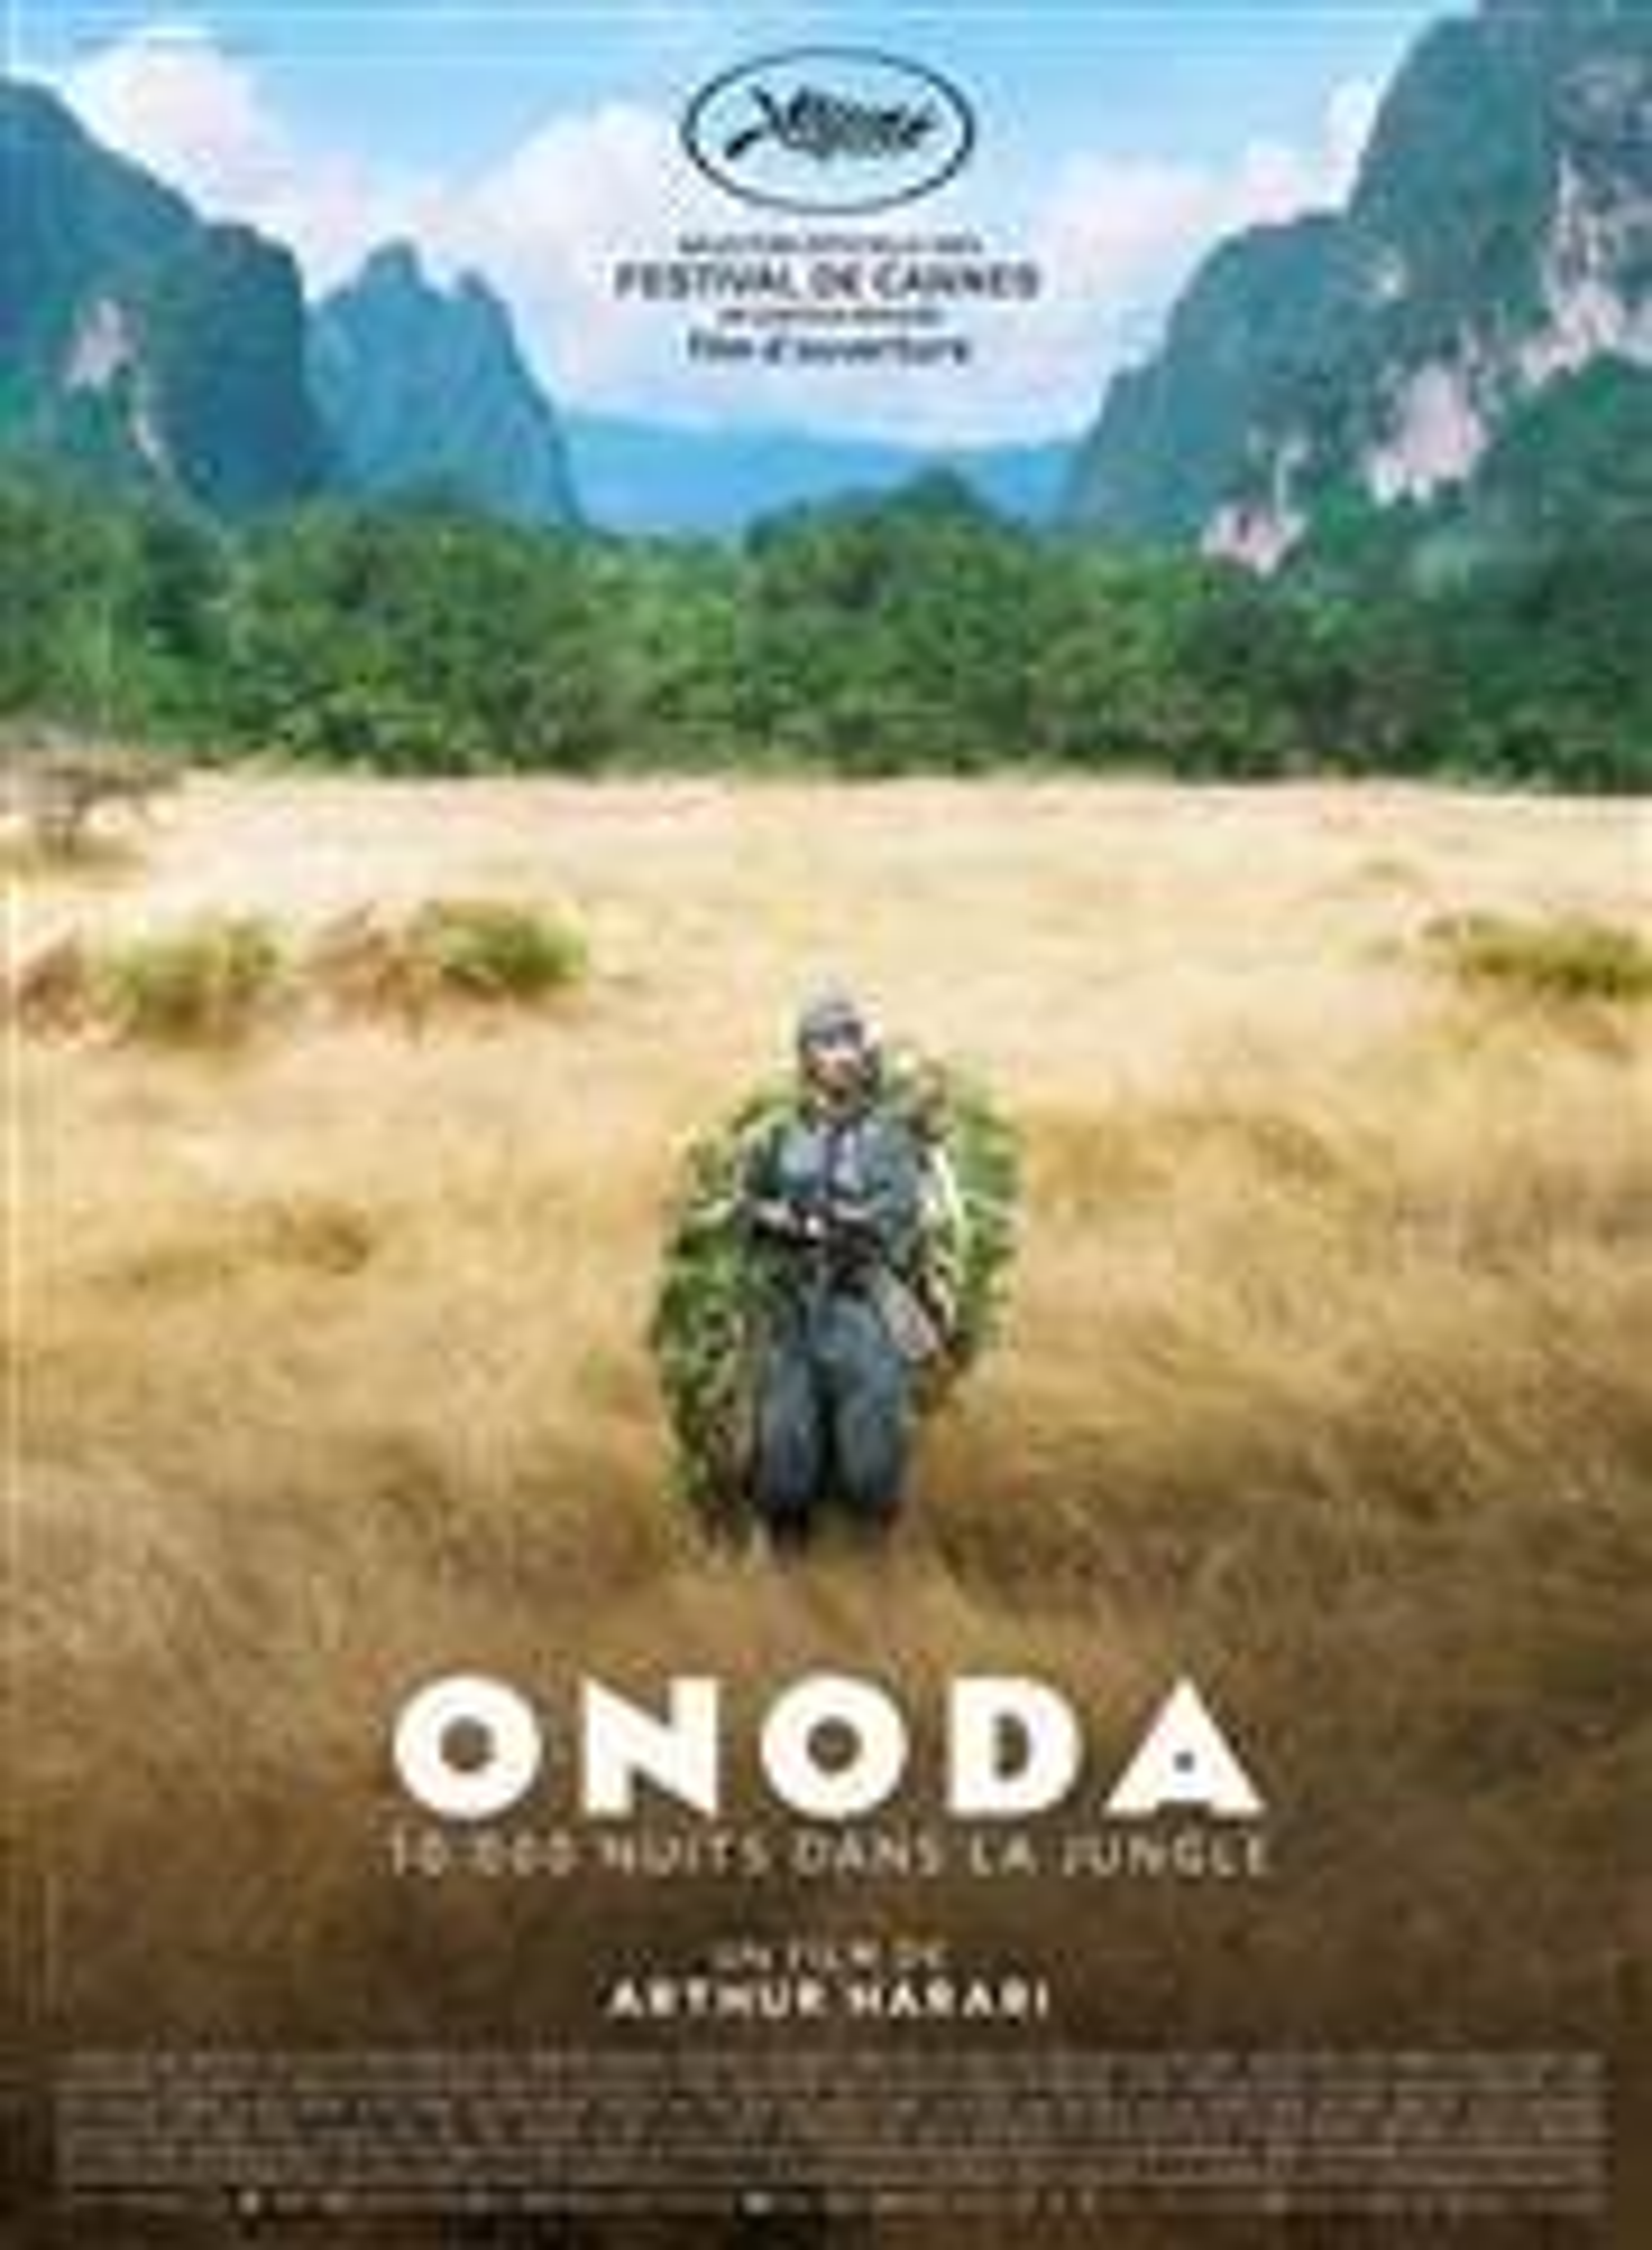 Onoda - 10 00 nuits dans la jungle